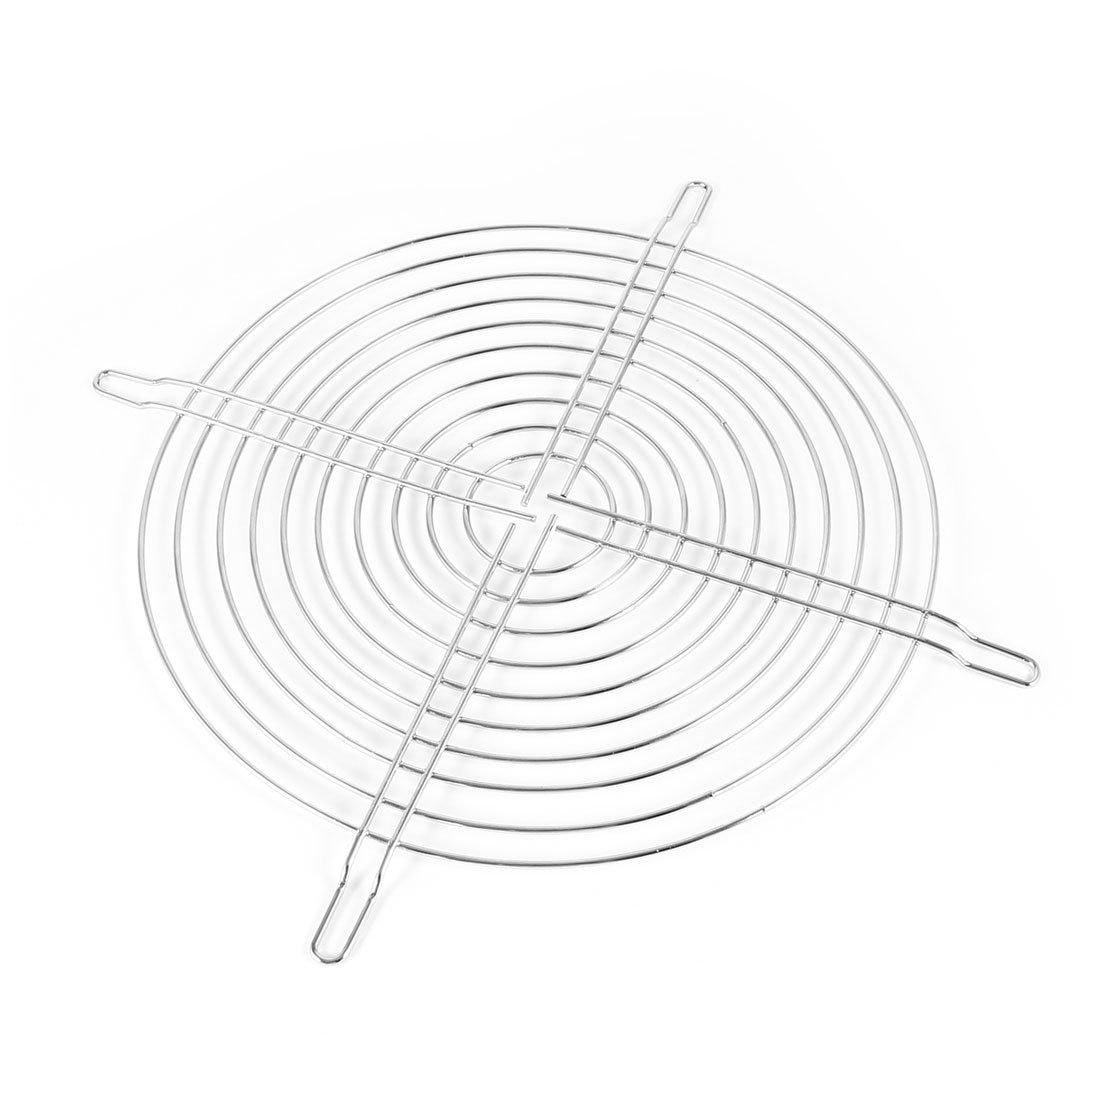 Portraiture of whirlpool duet sport dryer wiring diagram whirlpool get free image 666666 1100 1100